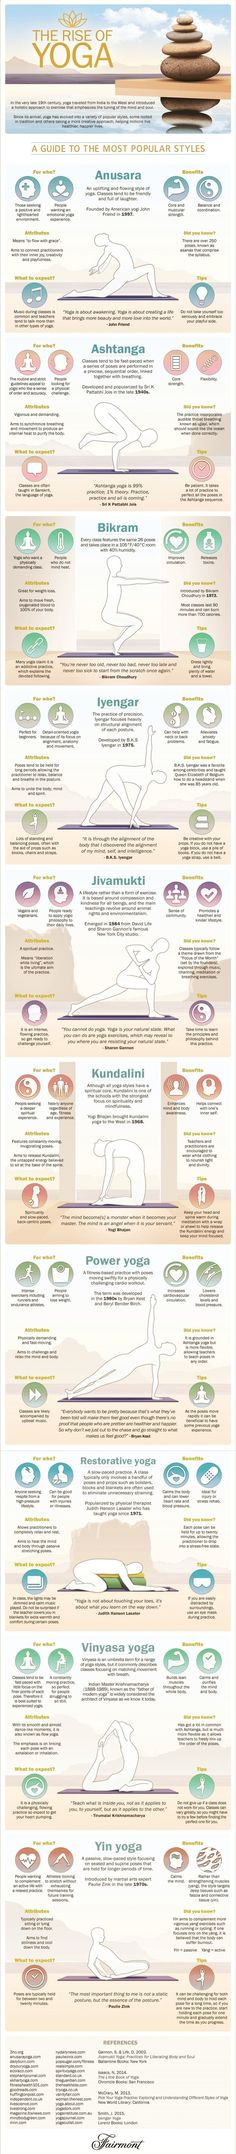 Most Popular Yoga Styles - Health Infographic. Topic: types of yoga, yogi, exercise, poses, postures, Anusara, Ashtanga, Bikram, Kripalu, Hatha, Iyengar, Kundalini, Jivamukti, Prenatal, Restorative, Sivananda, Viniyoga, Yin, Power yoga. www.pinter www.yogaweightlos...